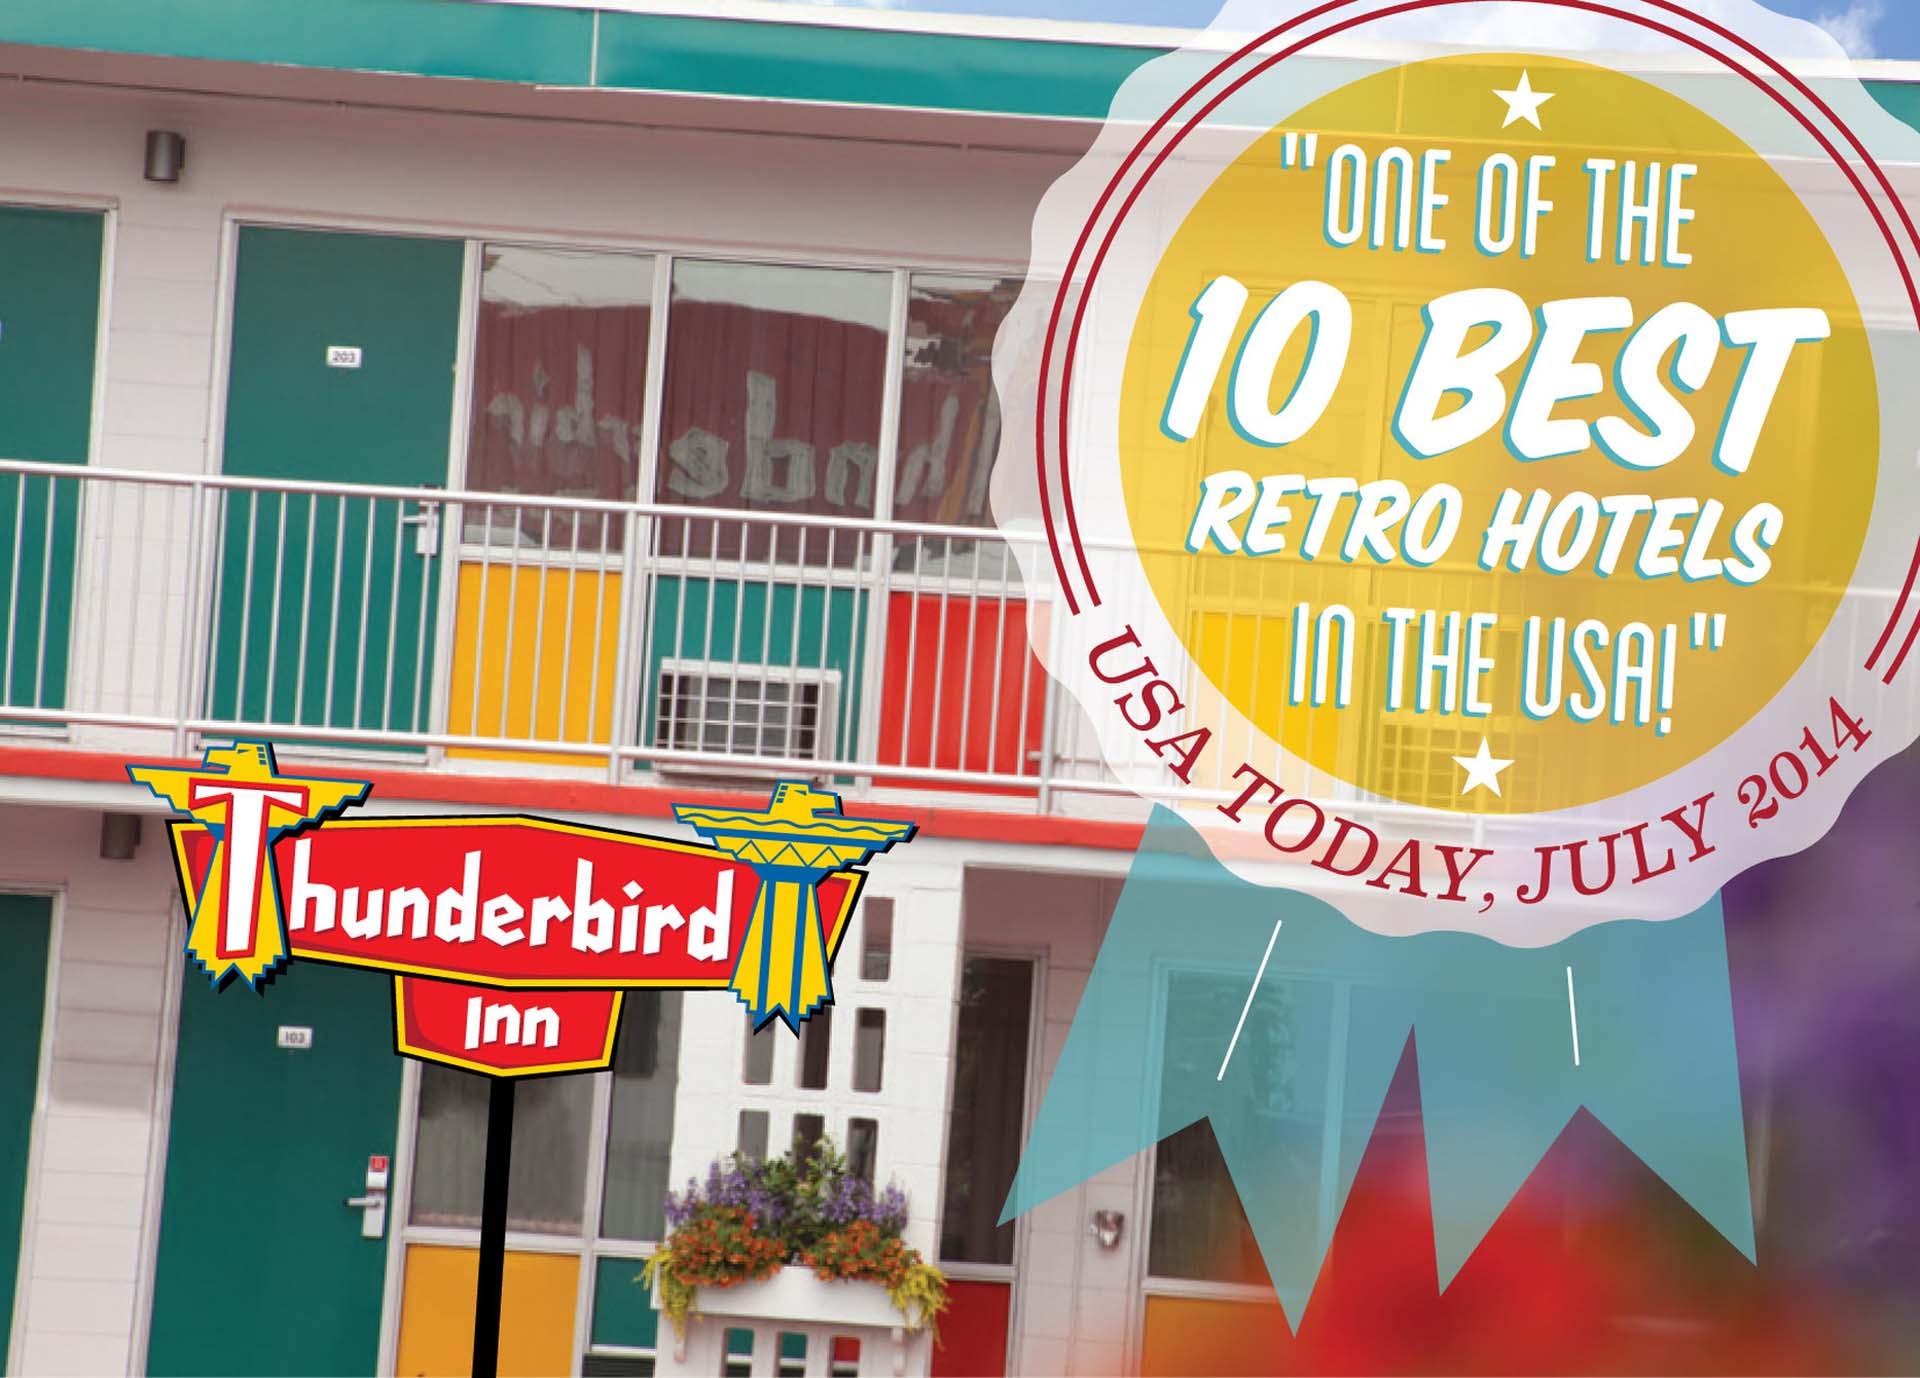 Retro Savannah Hotel The Thunderbird Inn